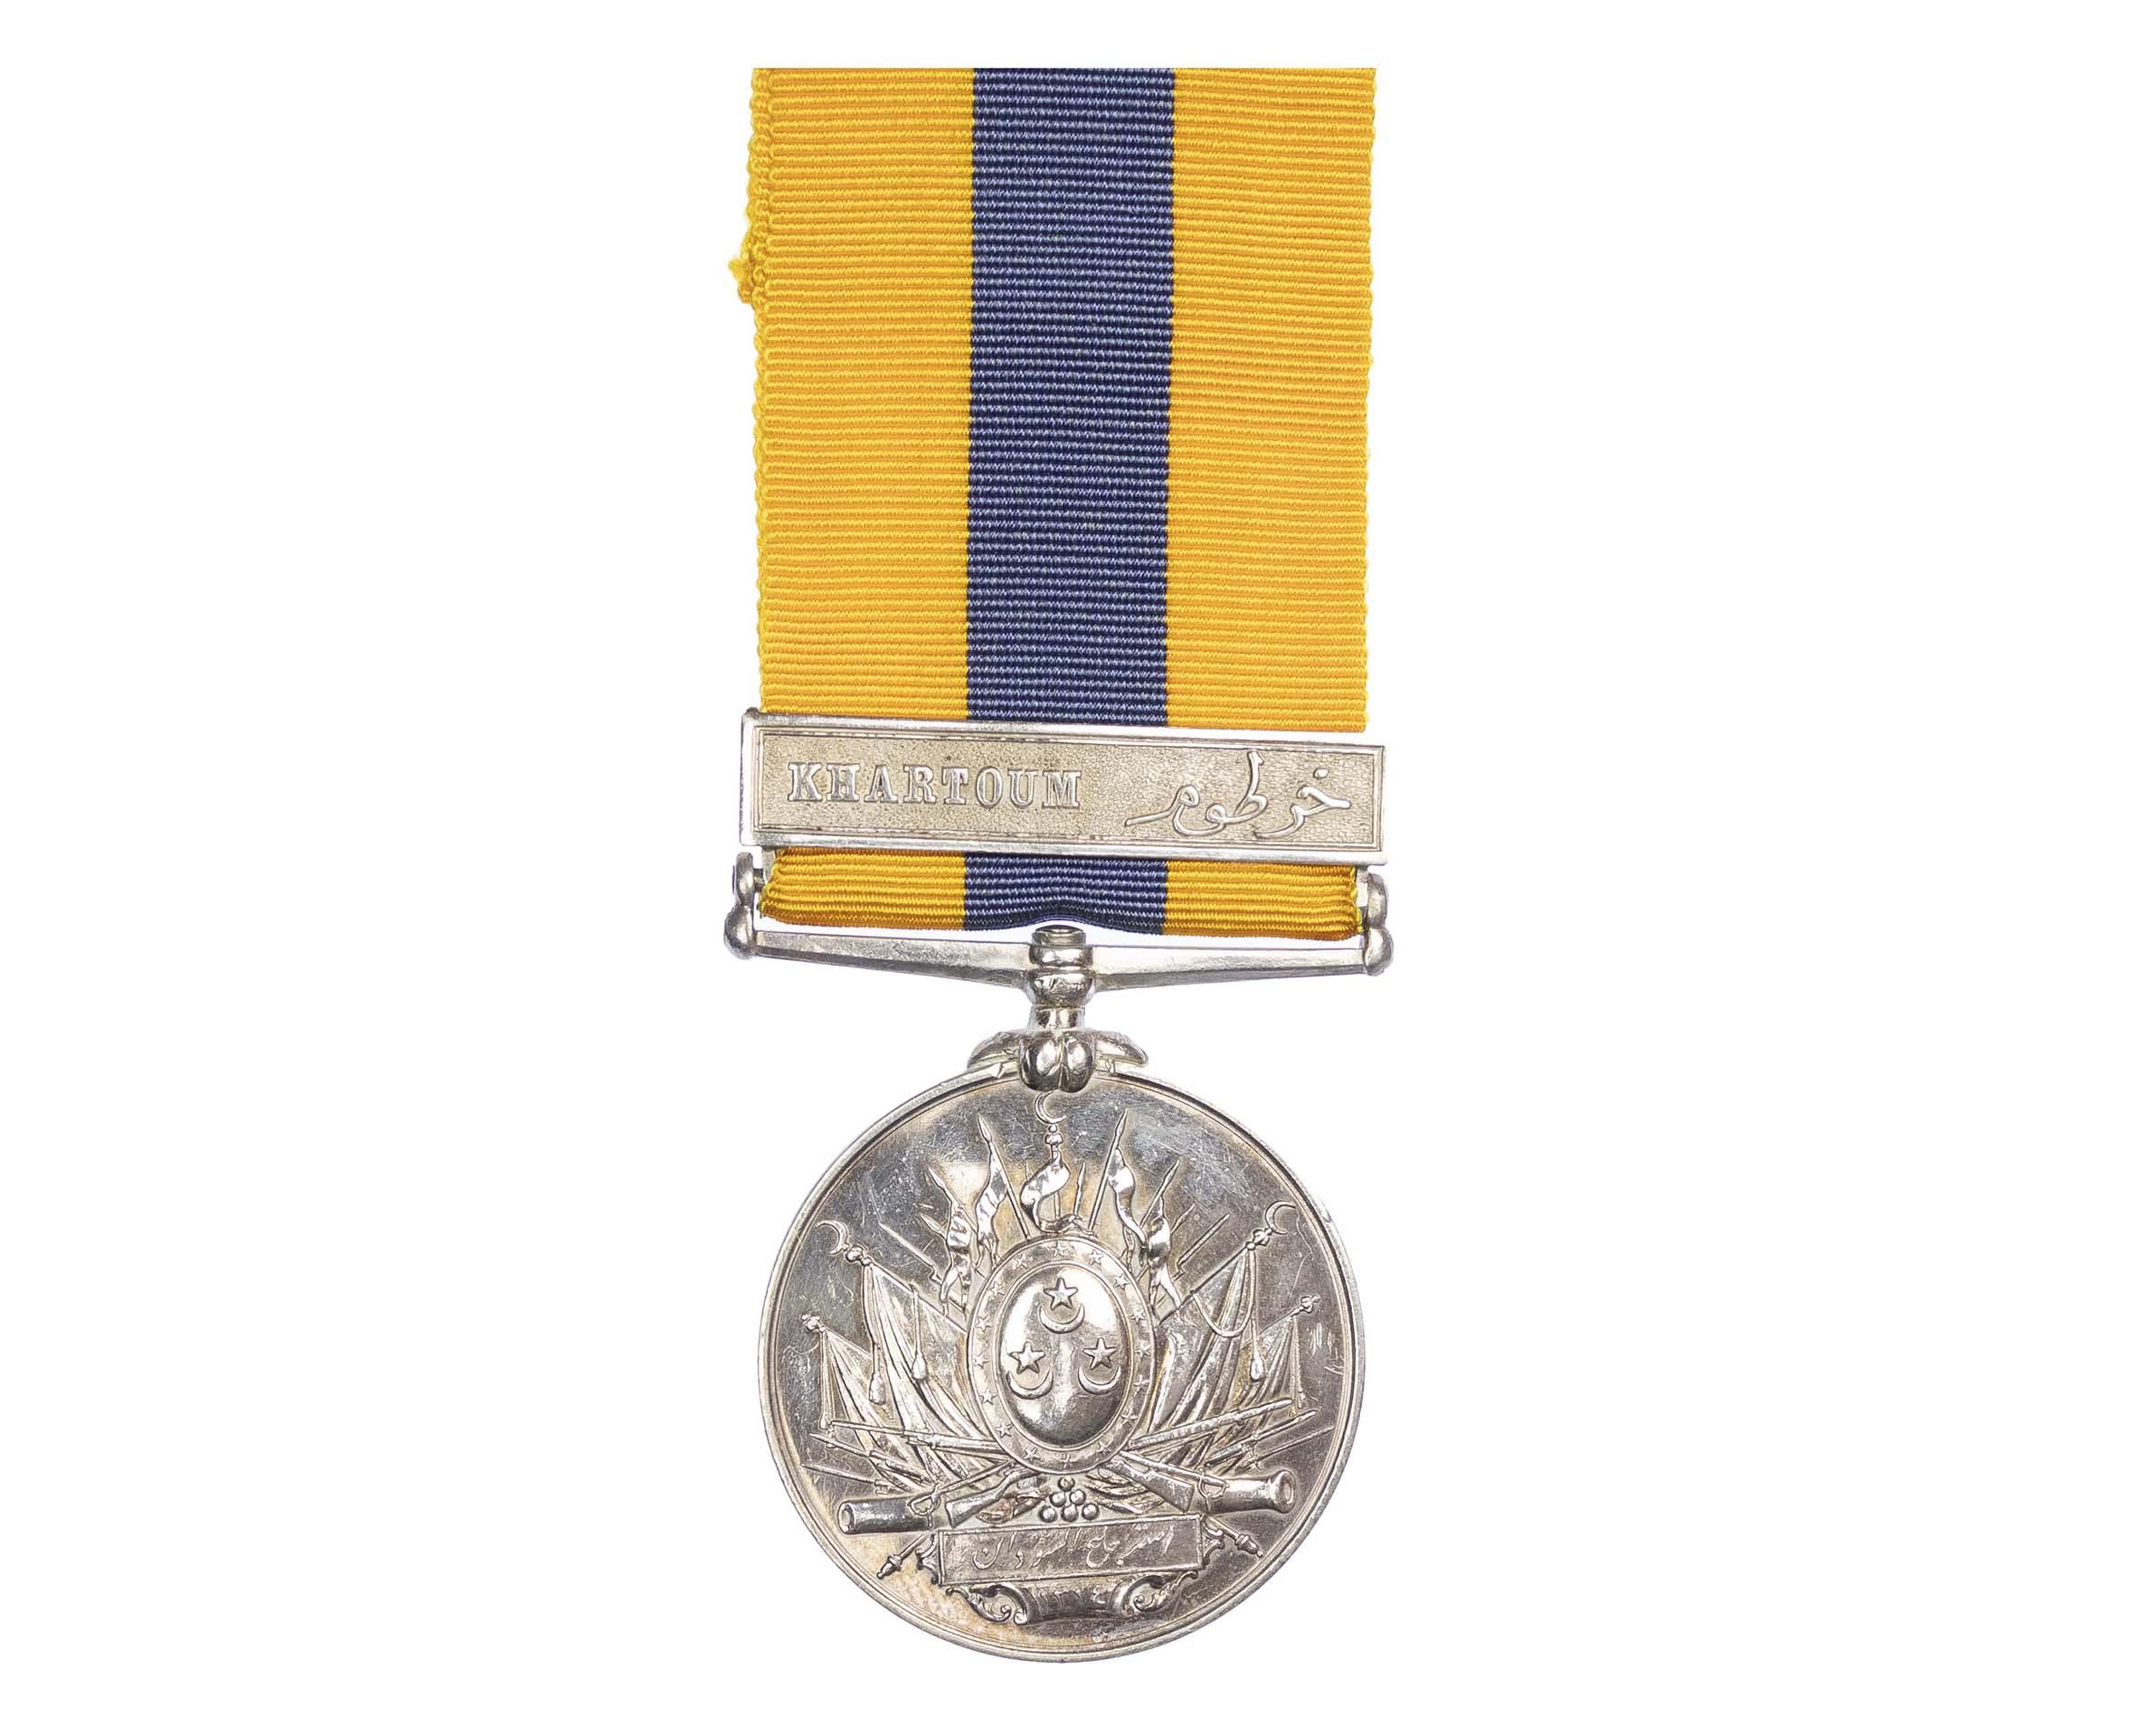 Khedive's Sudan Medal 1896-1908, one clasp, Khartoum